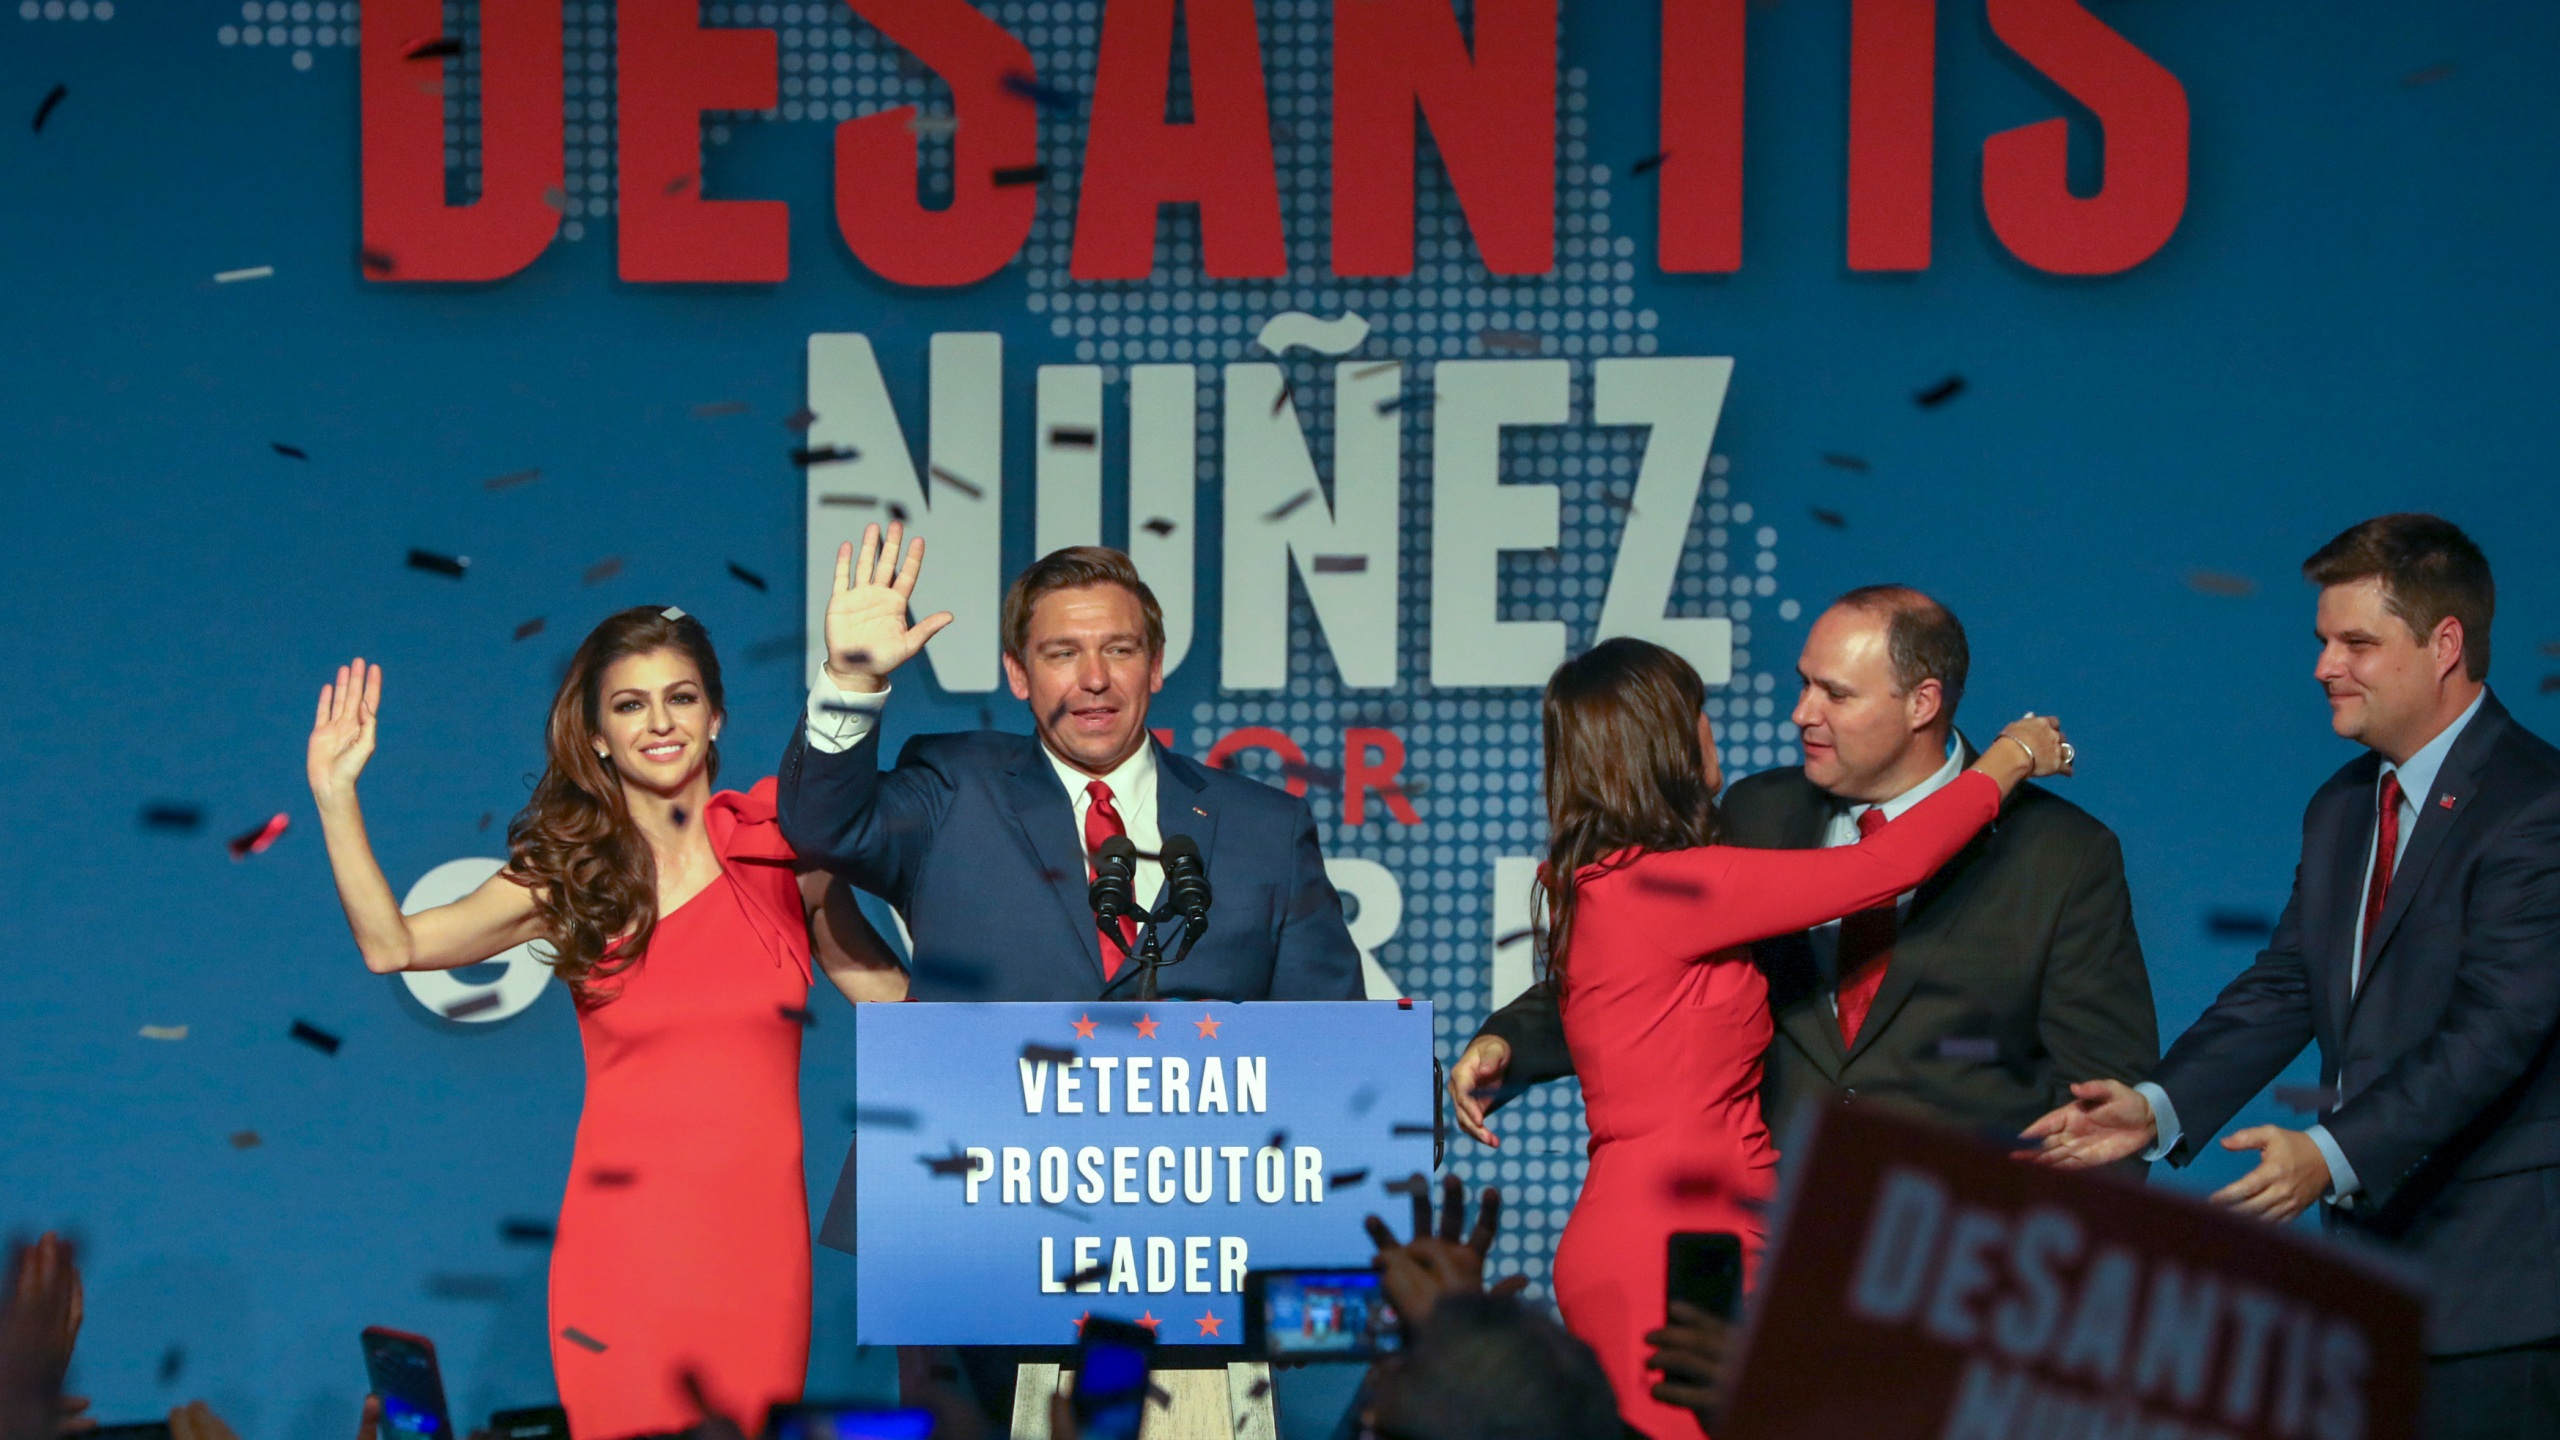 APTOPIX_Election_2018_Governor_DeSantis_Florida_05193-159532.jpg64866867